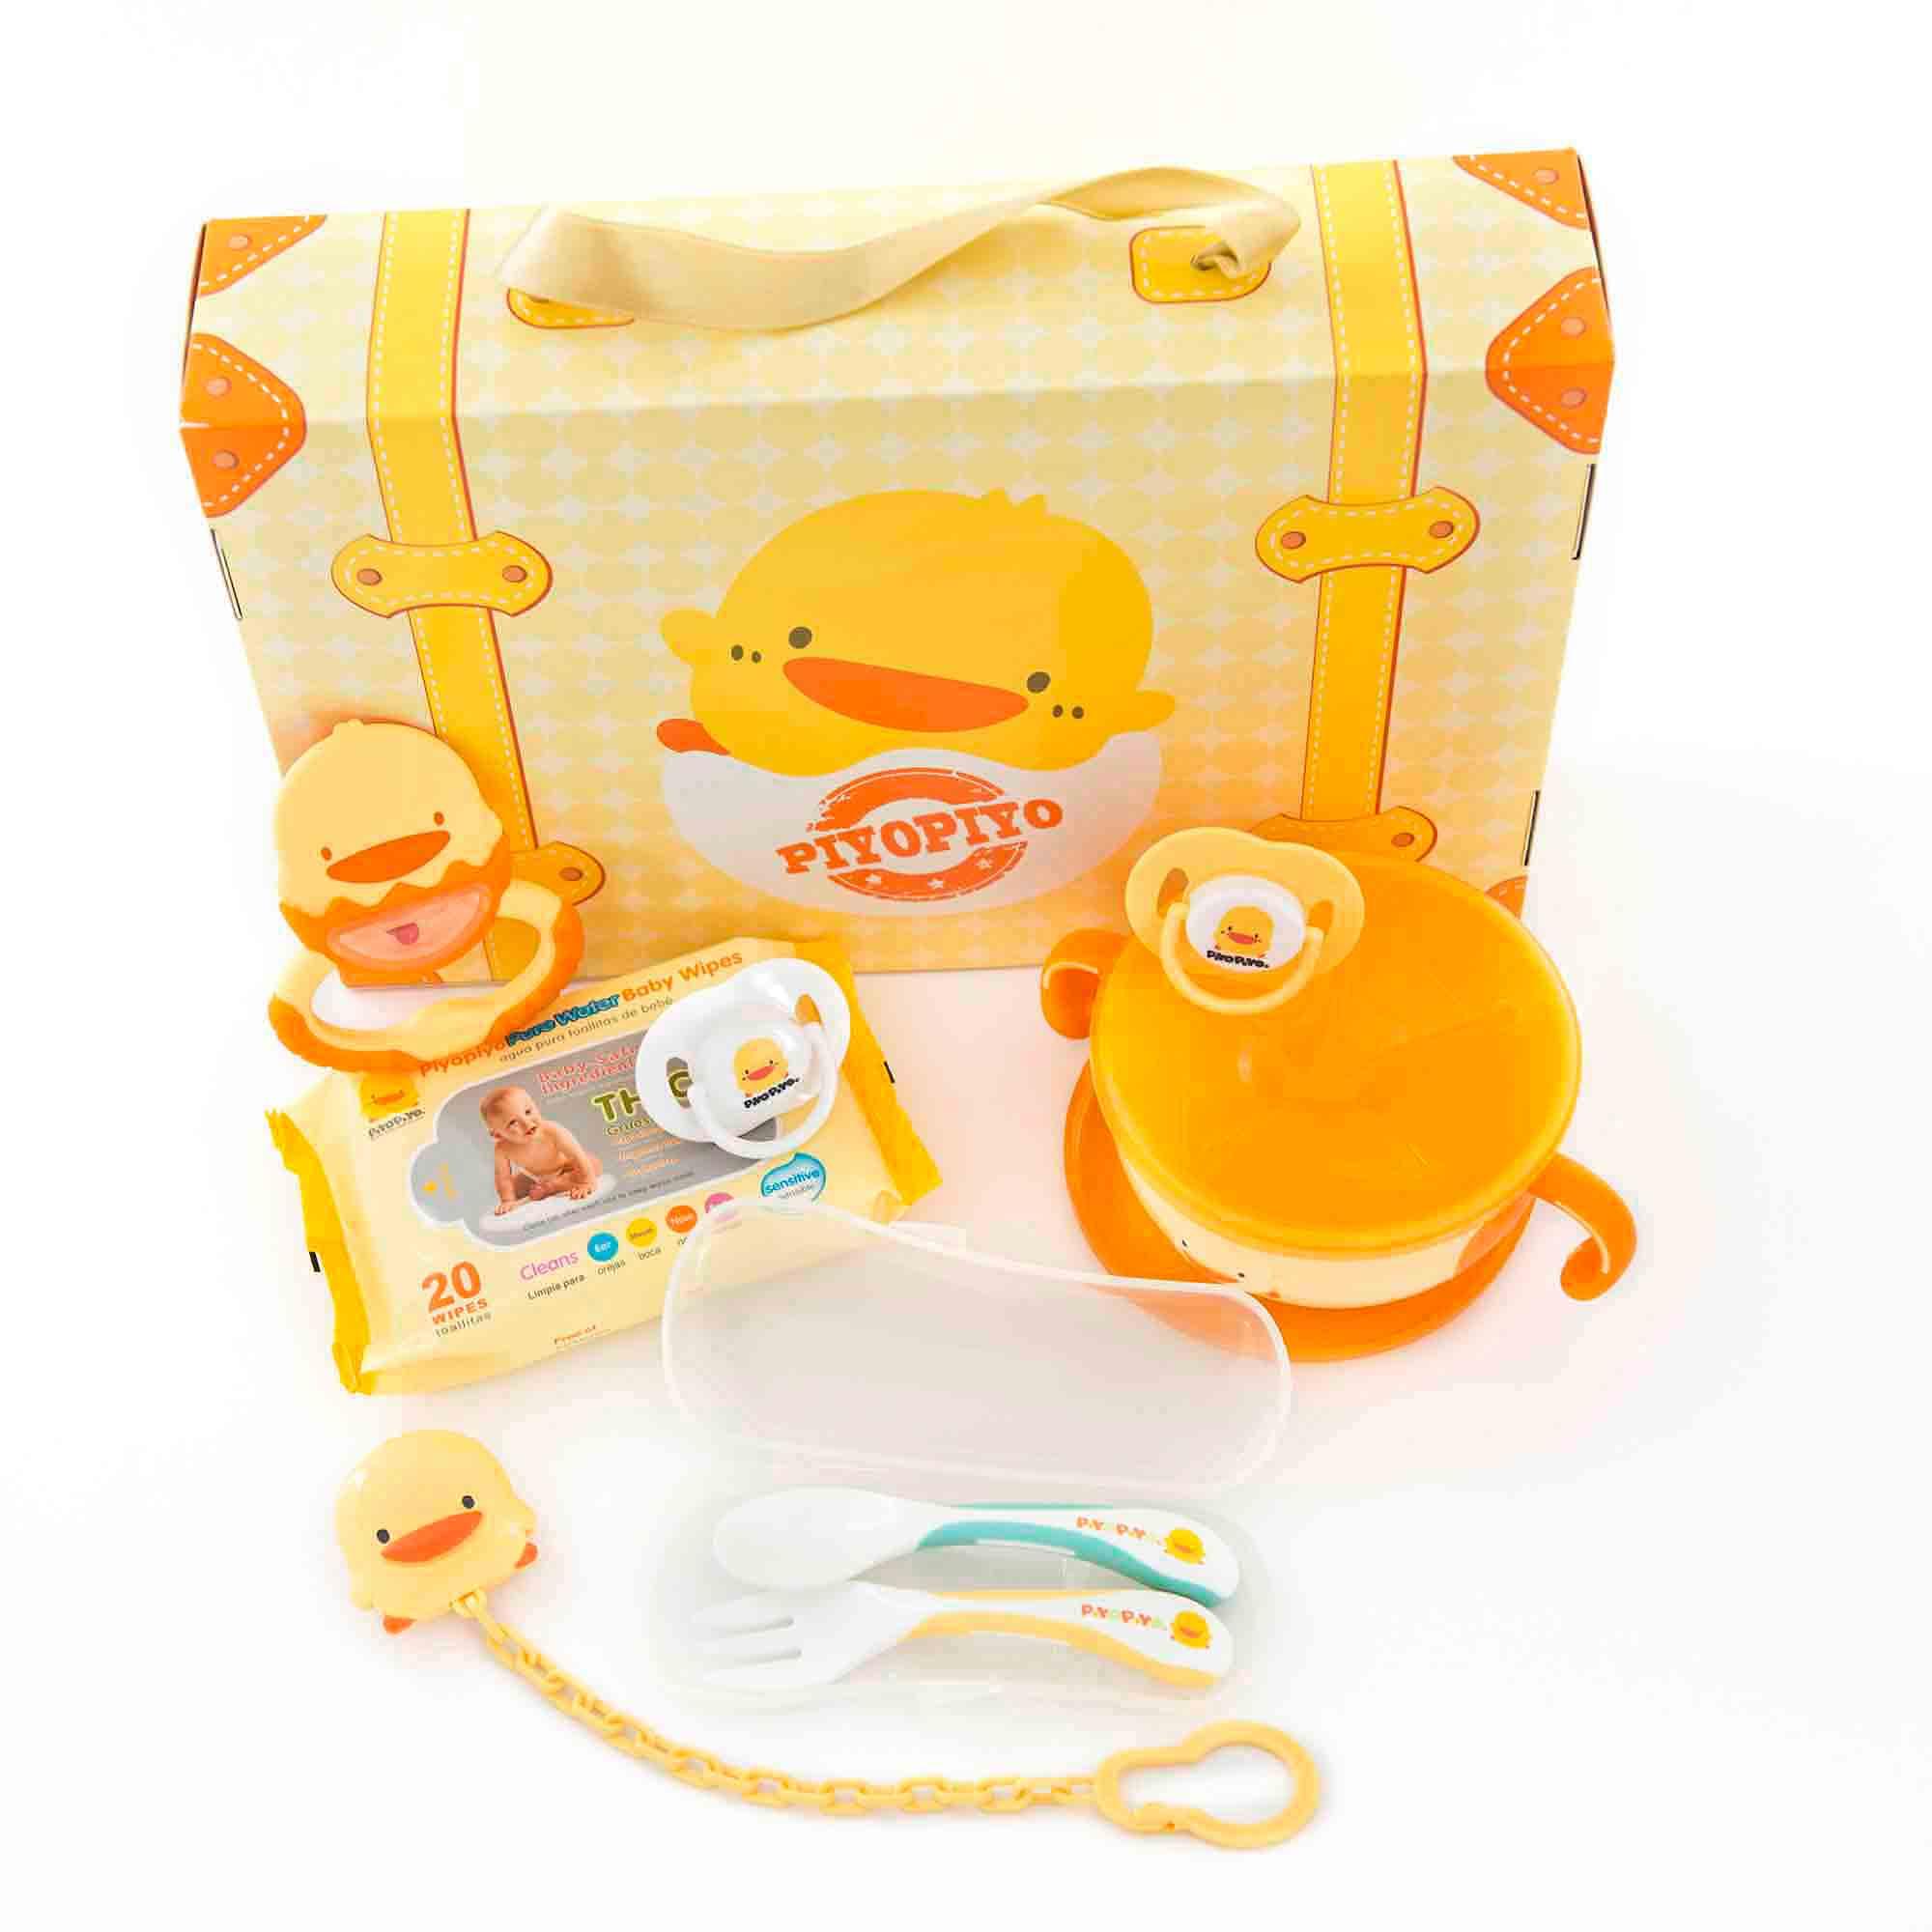 Piyo Piyo Baby Travel Kit